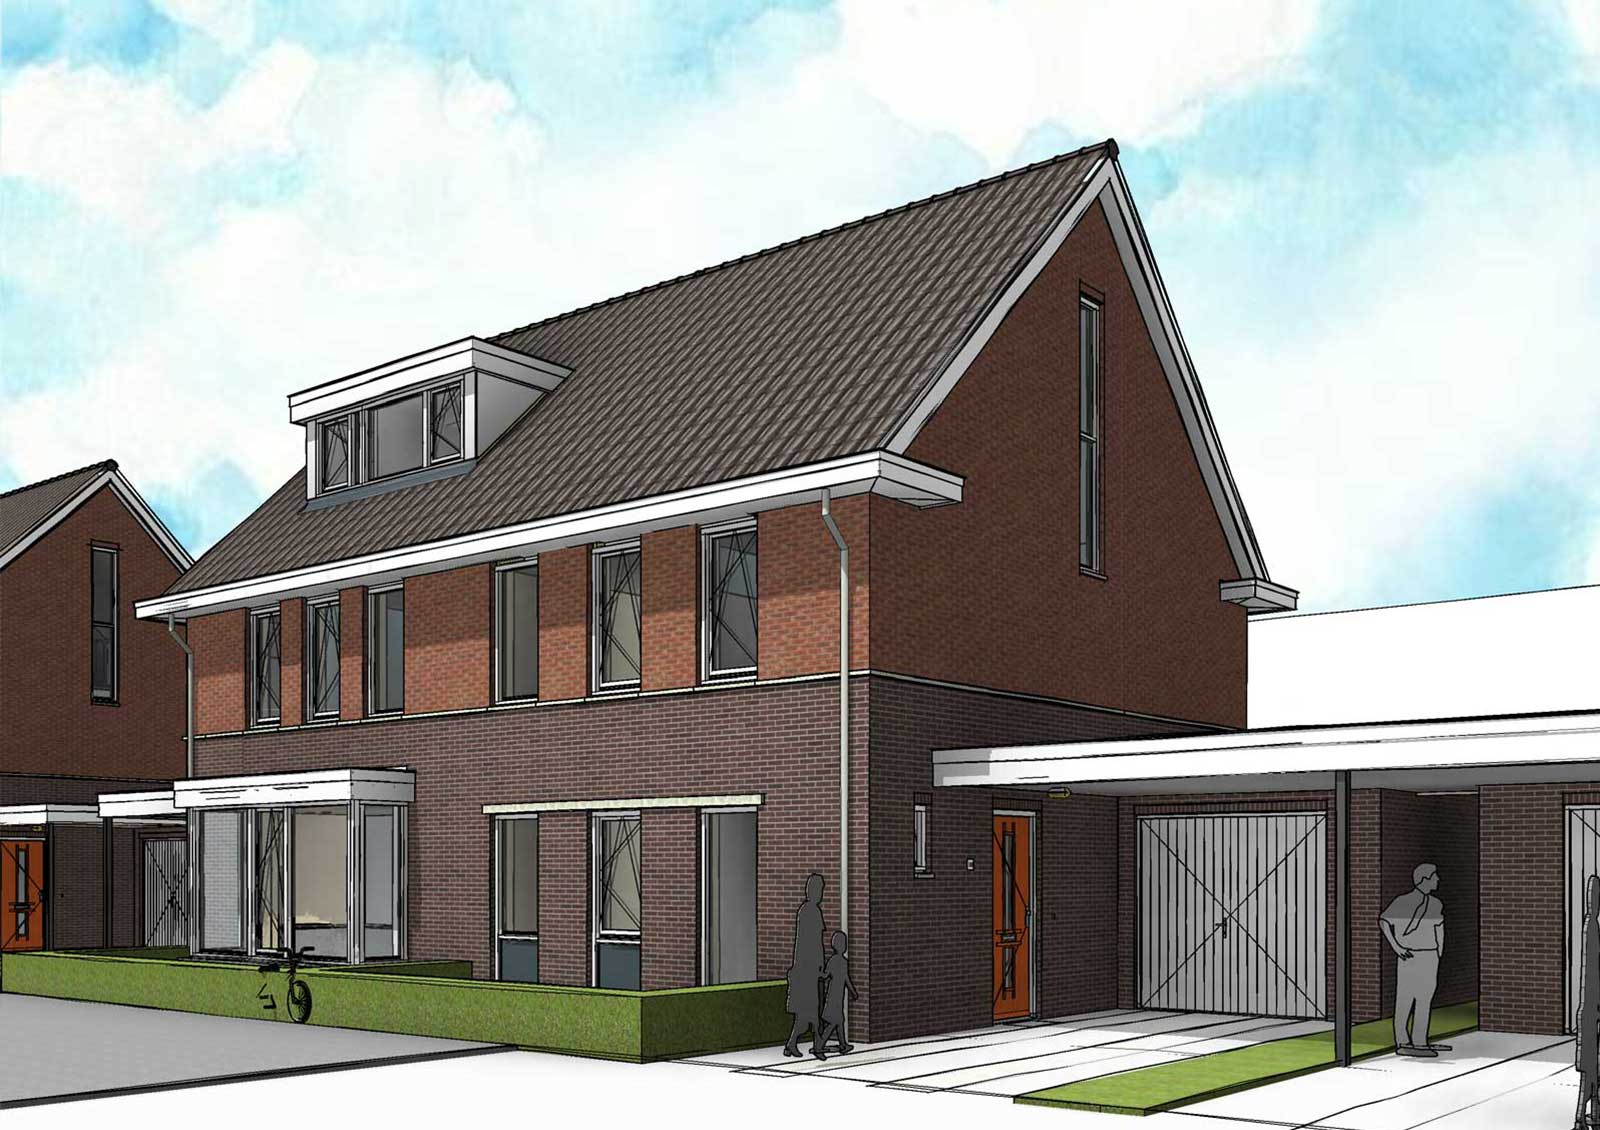 impressie BIM model kavel 2 - CPO Oudenbosch 2 onder 1 kappers